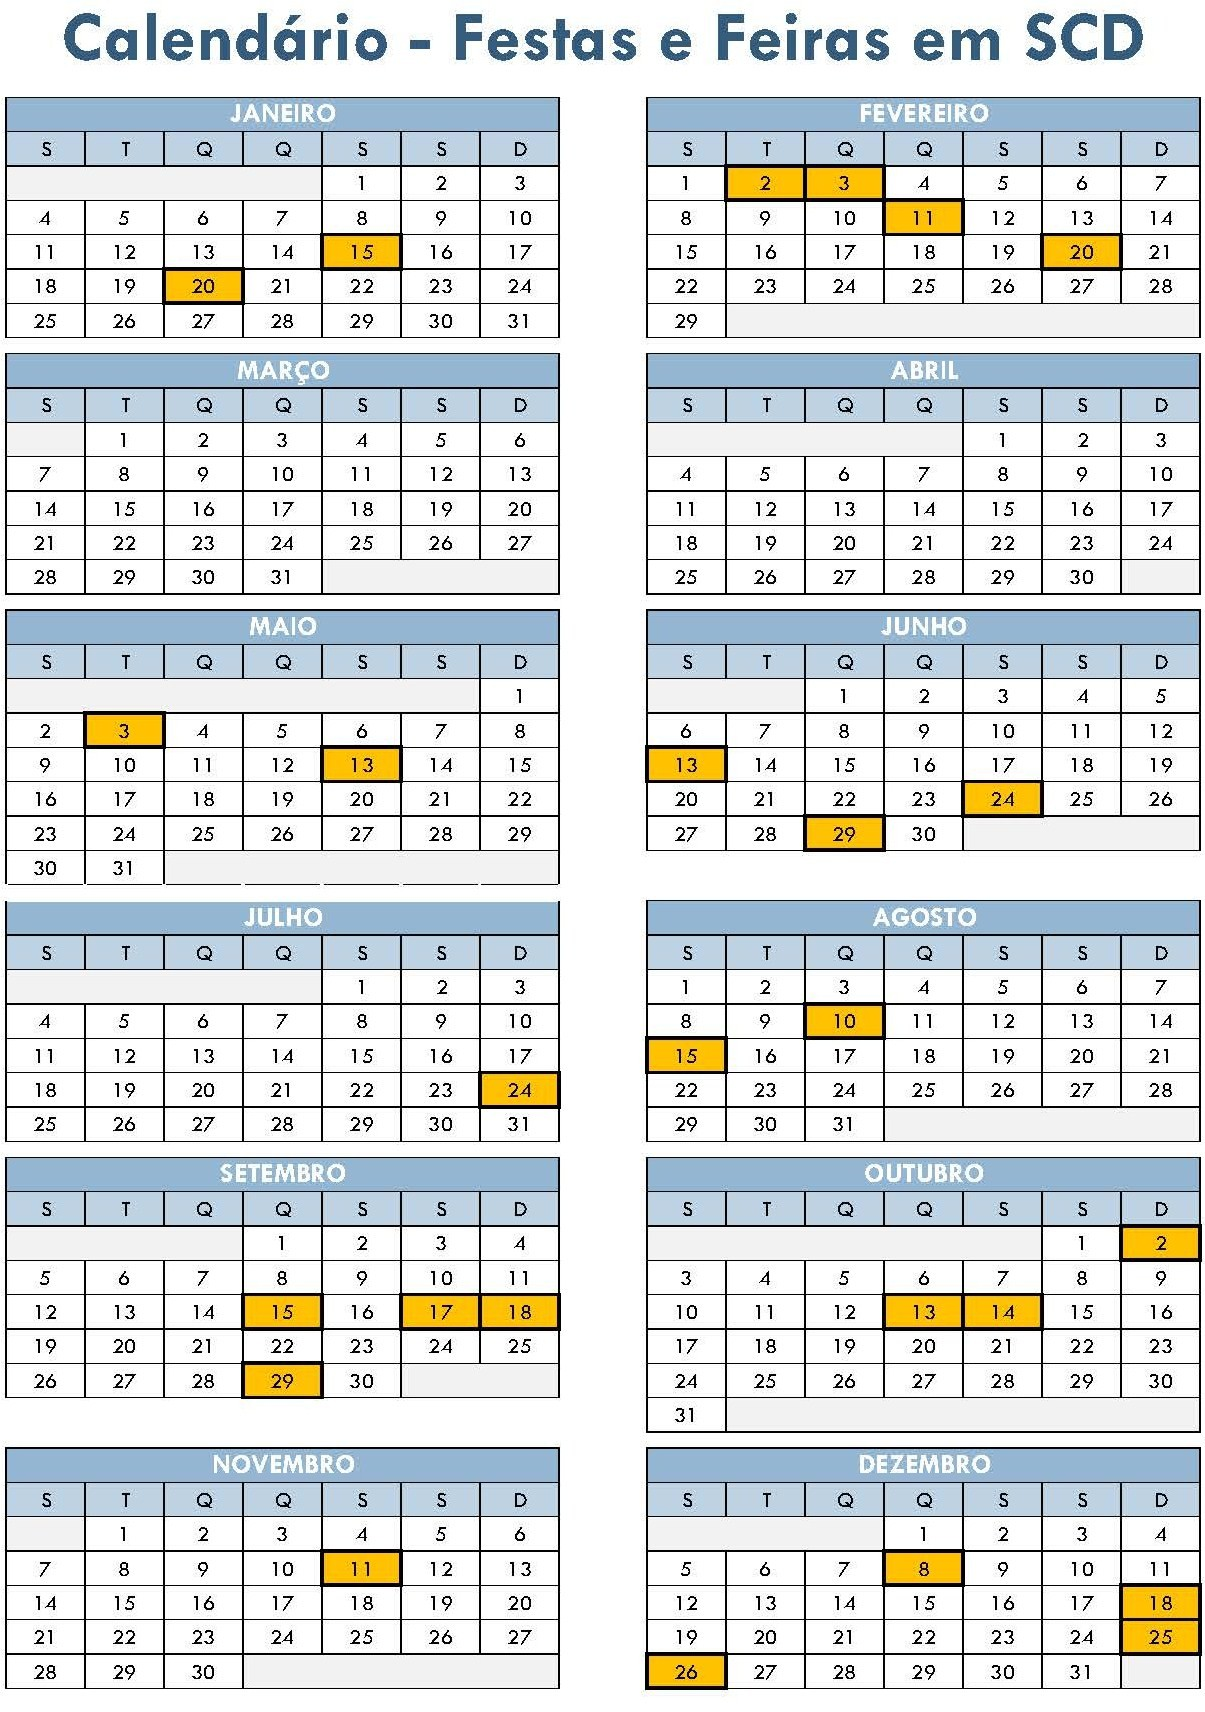 Calendario 2019 3d Más Recientemente Liberado eventos Religiosos No Concelho De Santa Ba D£o Of Calendario 2019 3d Más Recientes Notizie